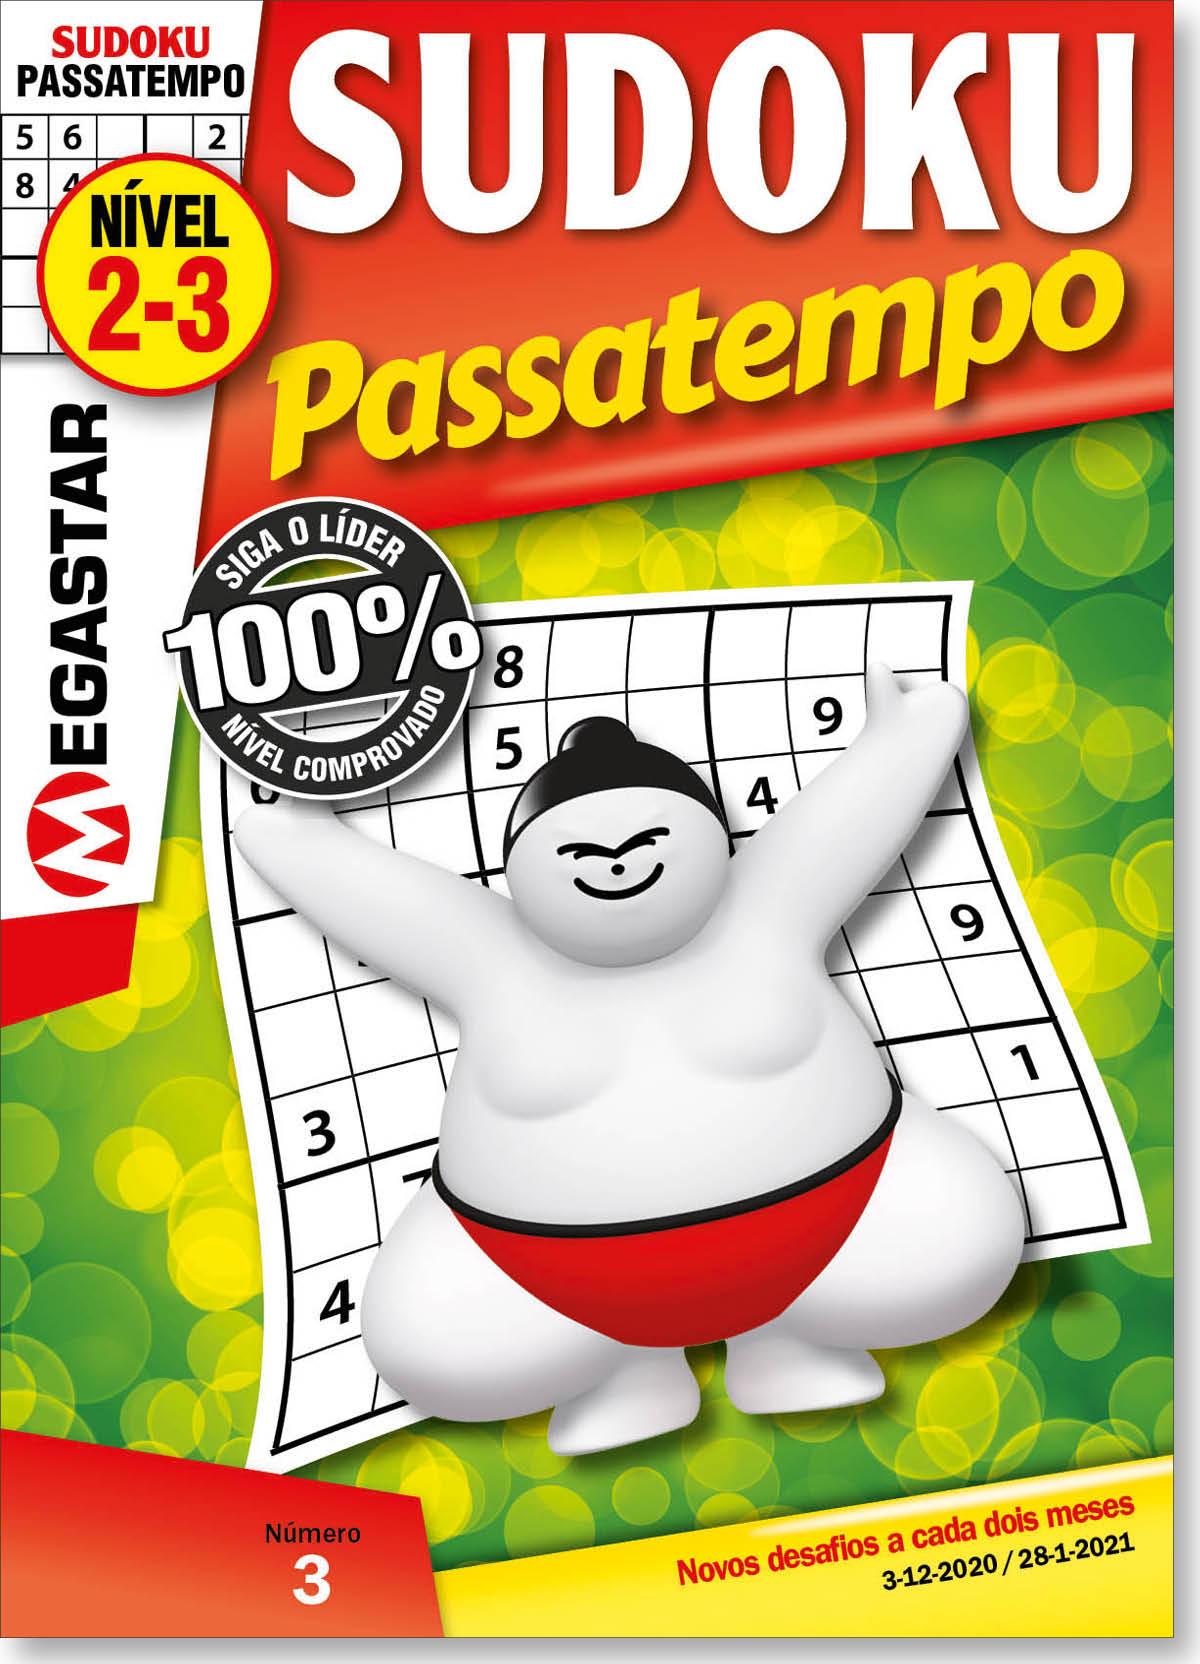 Sudoku Passatempo 2-3